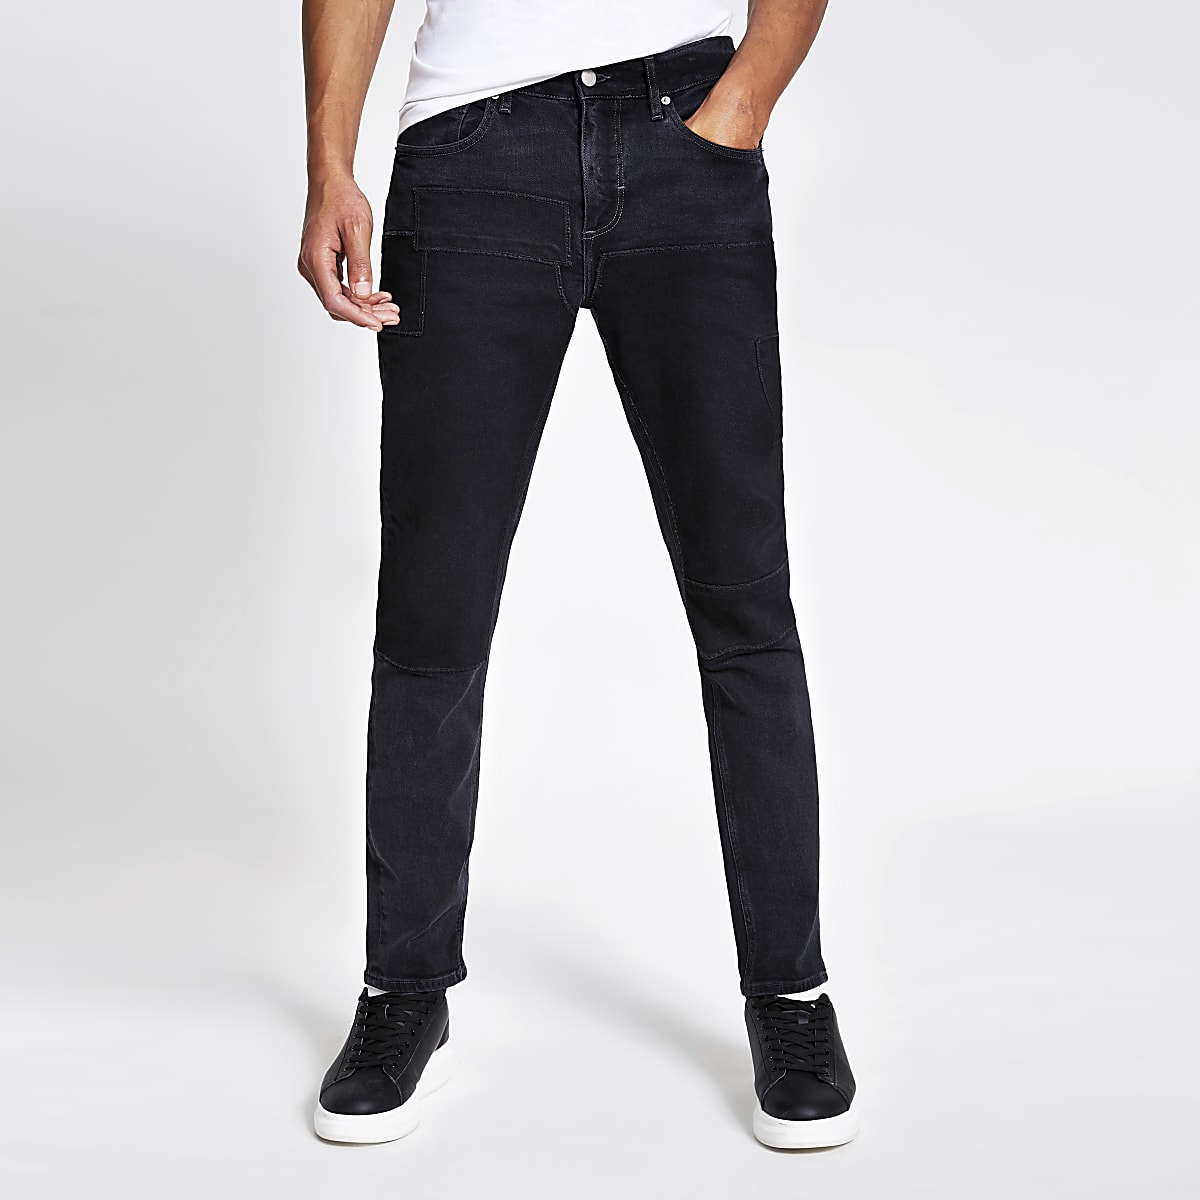 Dylan - Jean slim stretch patchwork noir